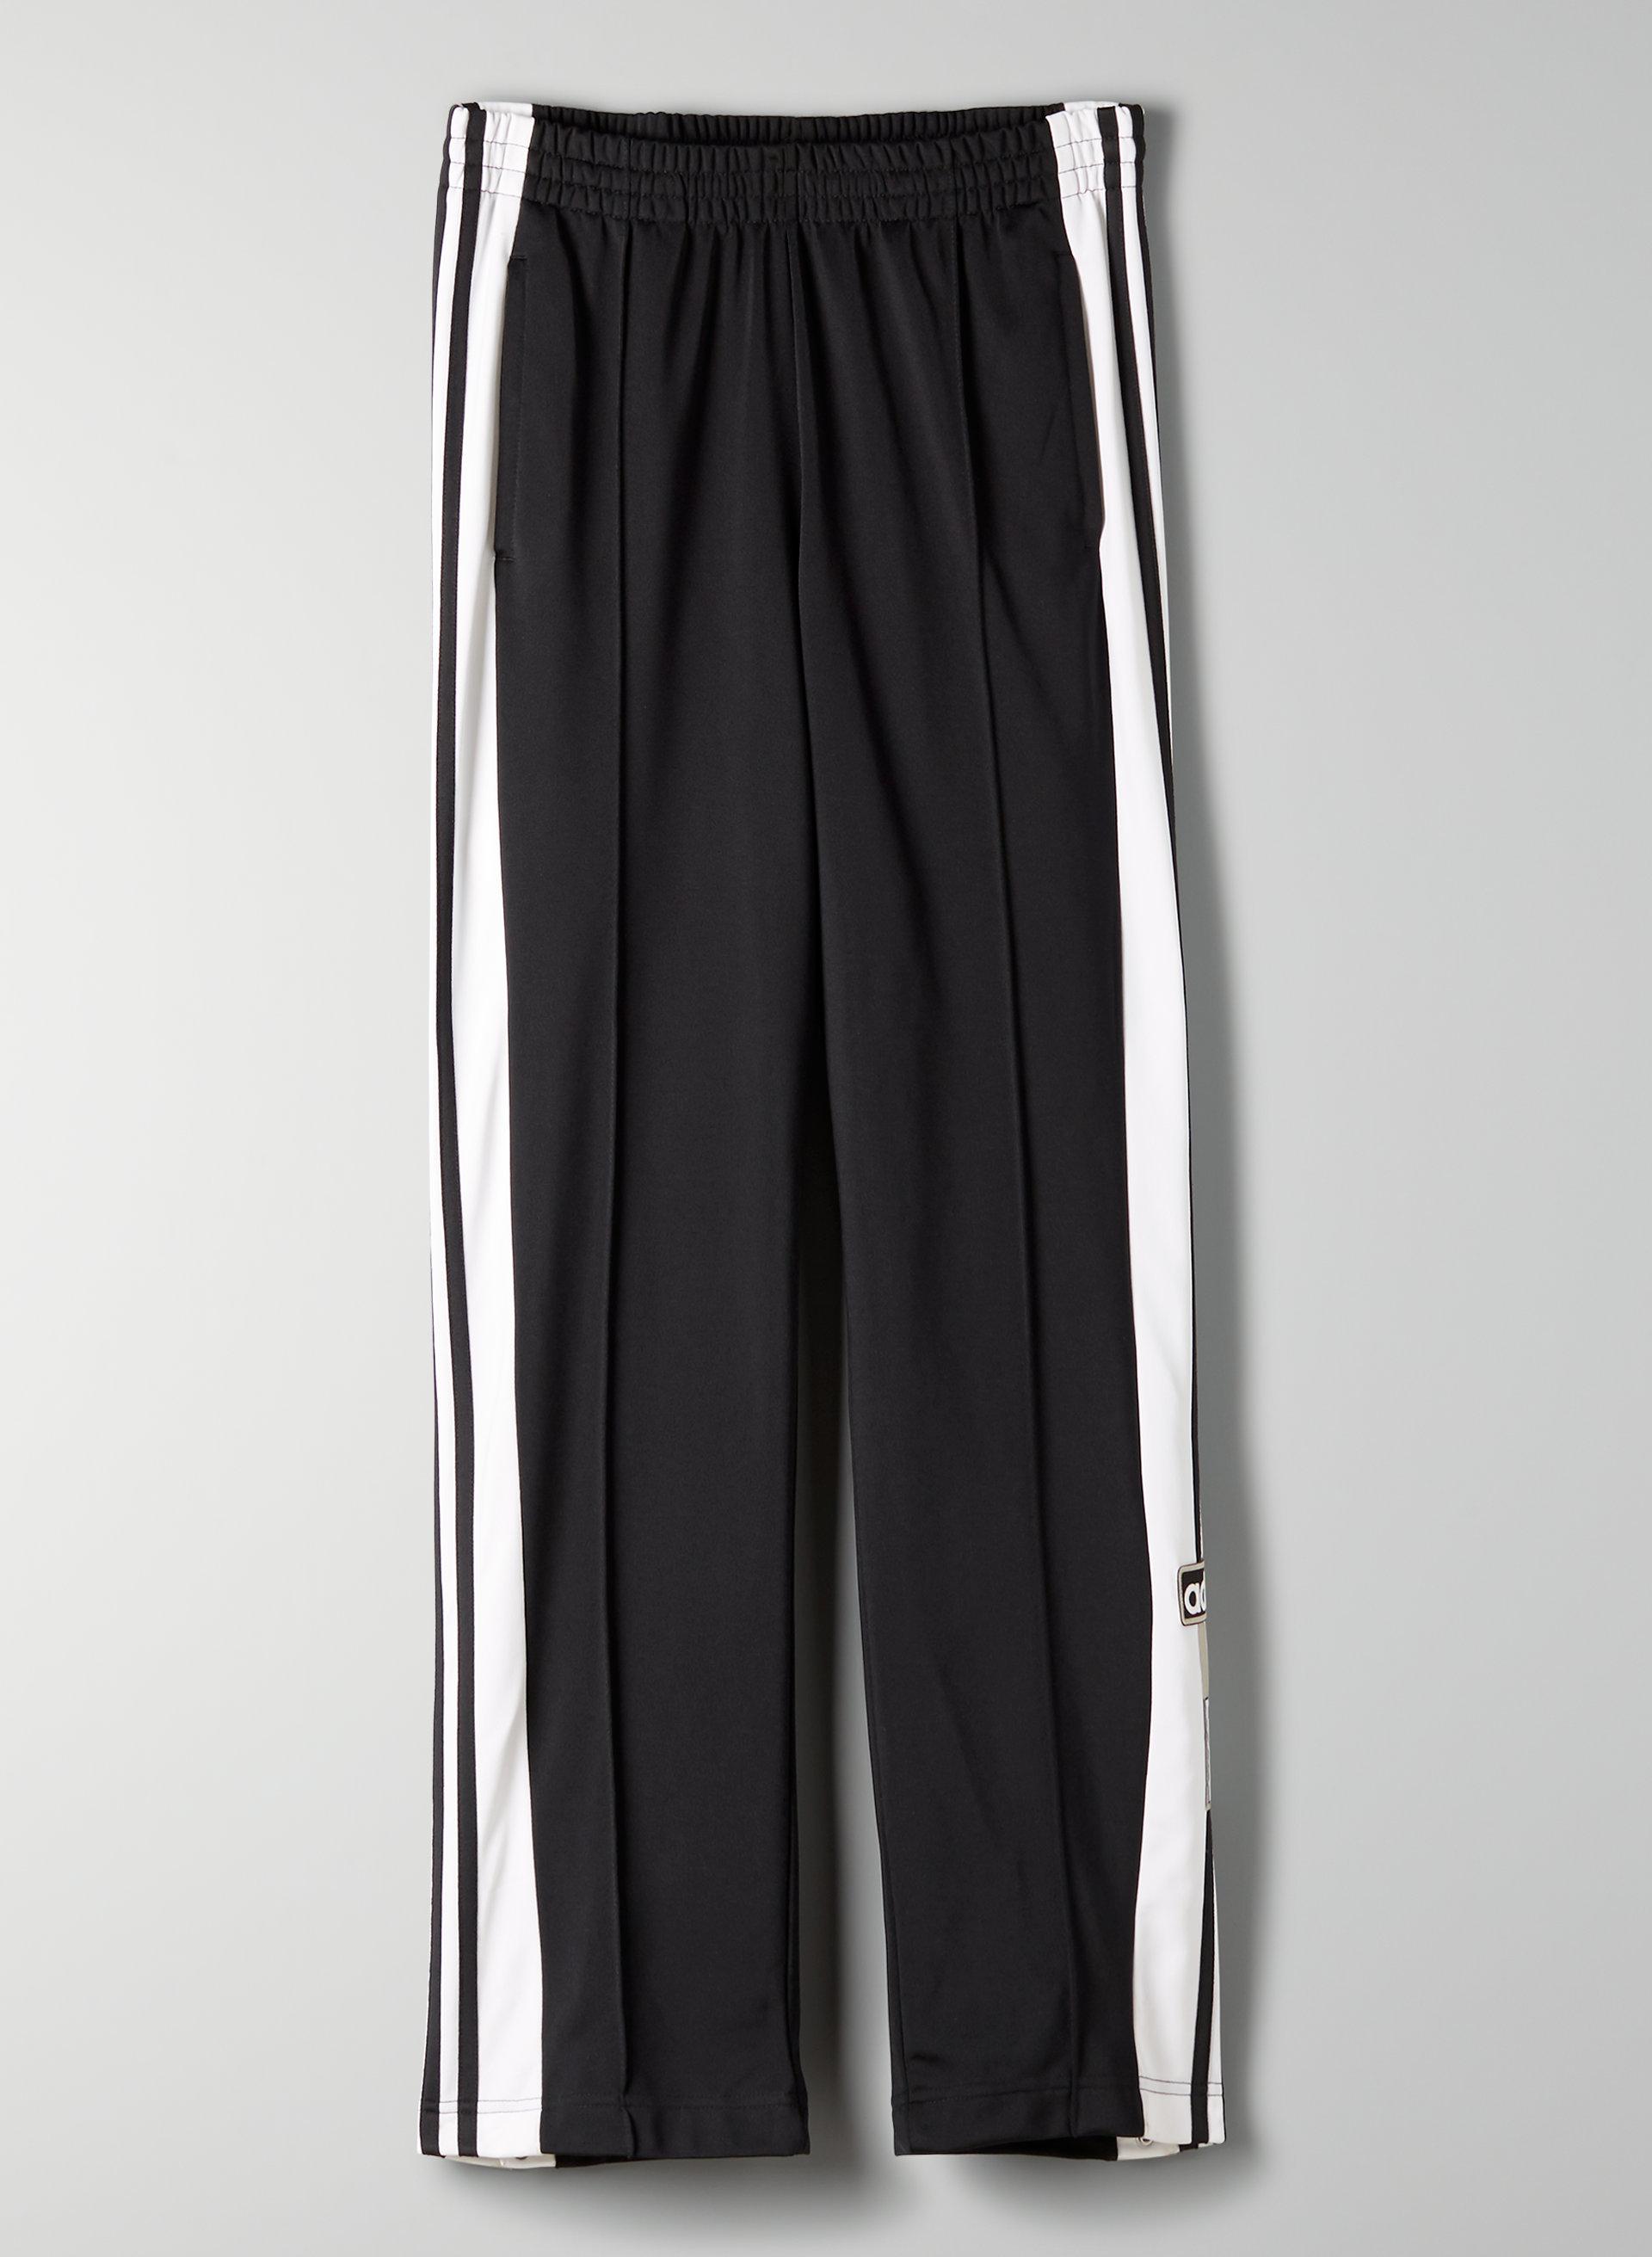 adidas OG ADIBREAK TRACK PANT   Aritzia CA